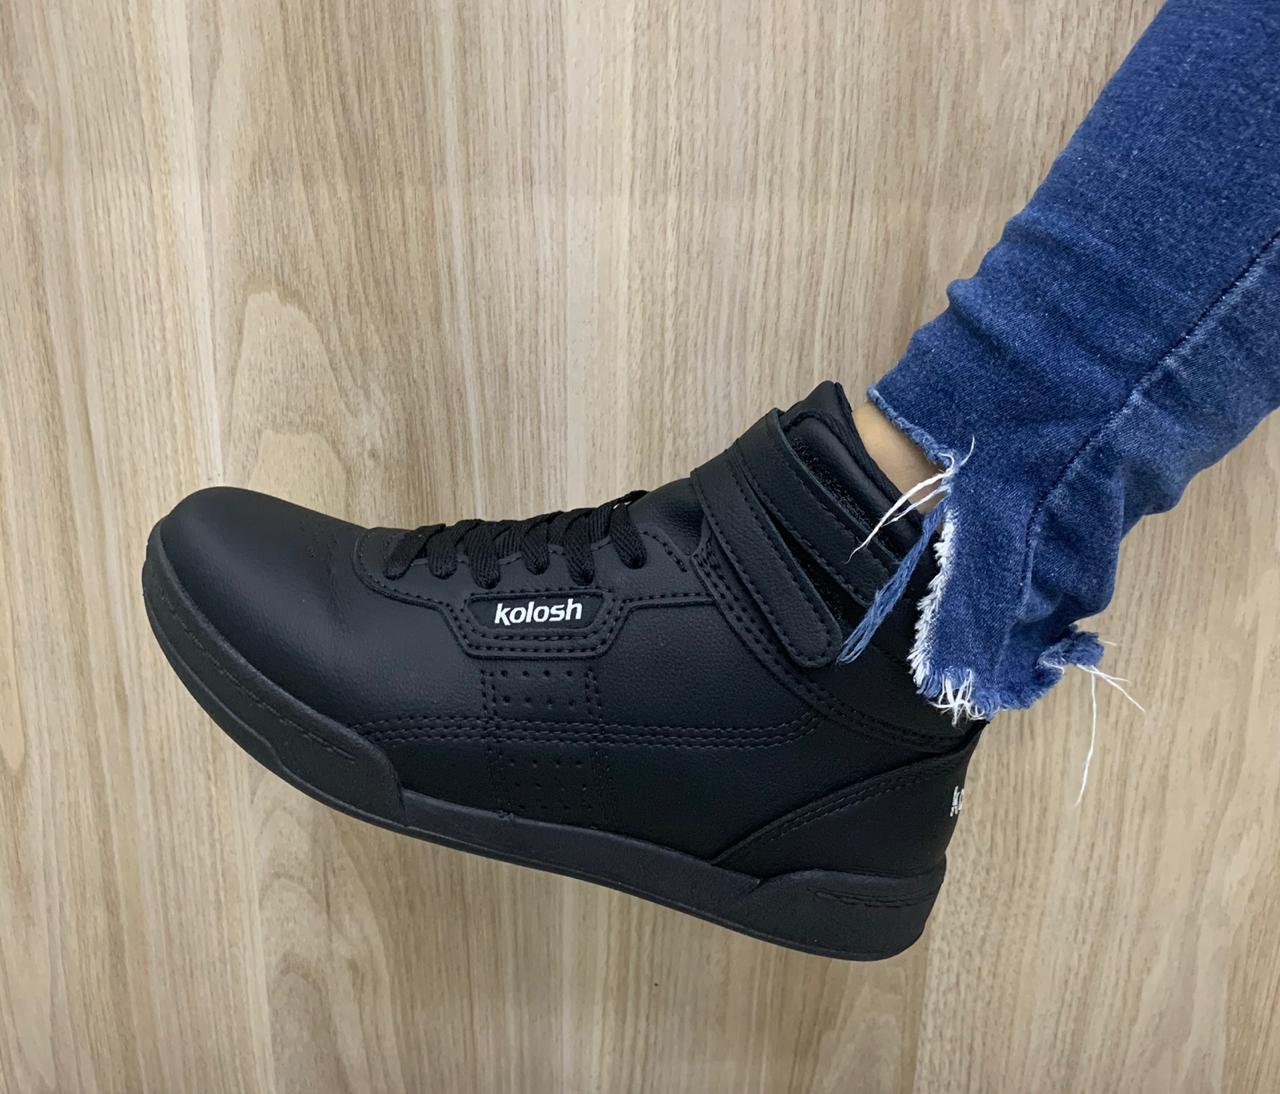 Tênis Kolosh Sneaker Cano Alto Bota Velcro C1668 Feminino